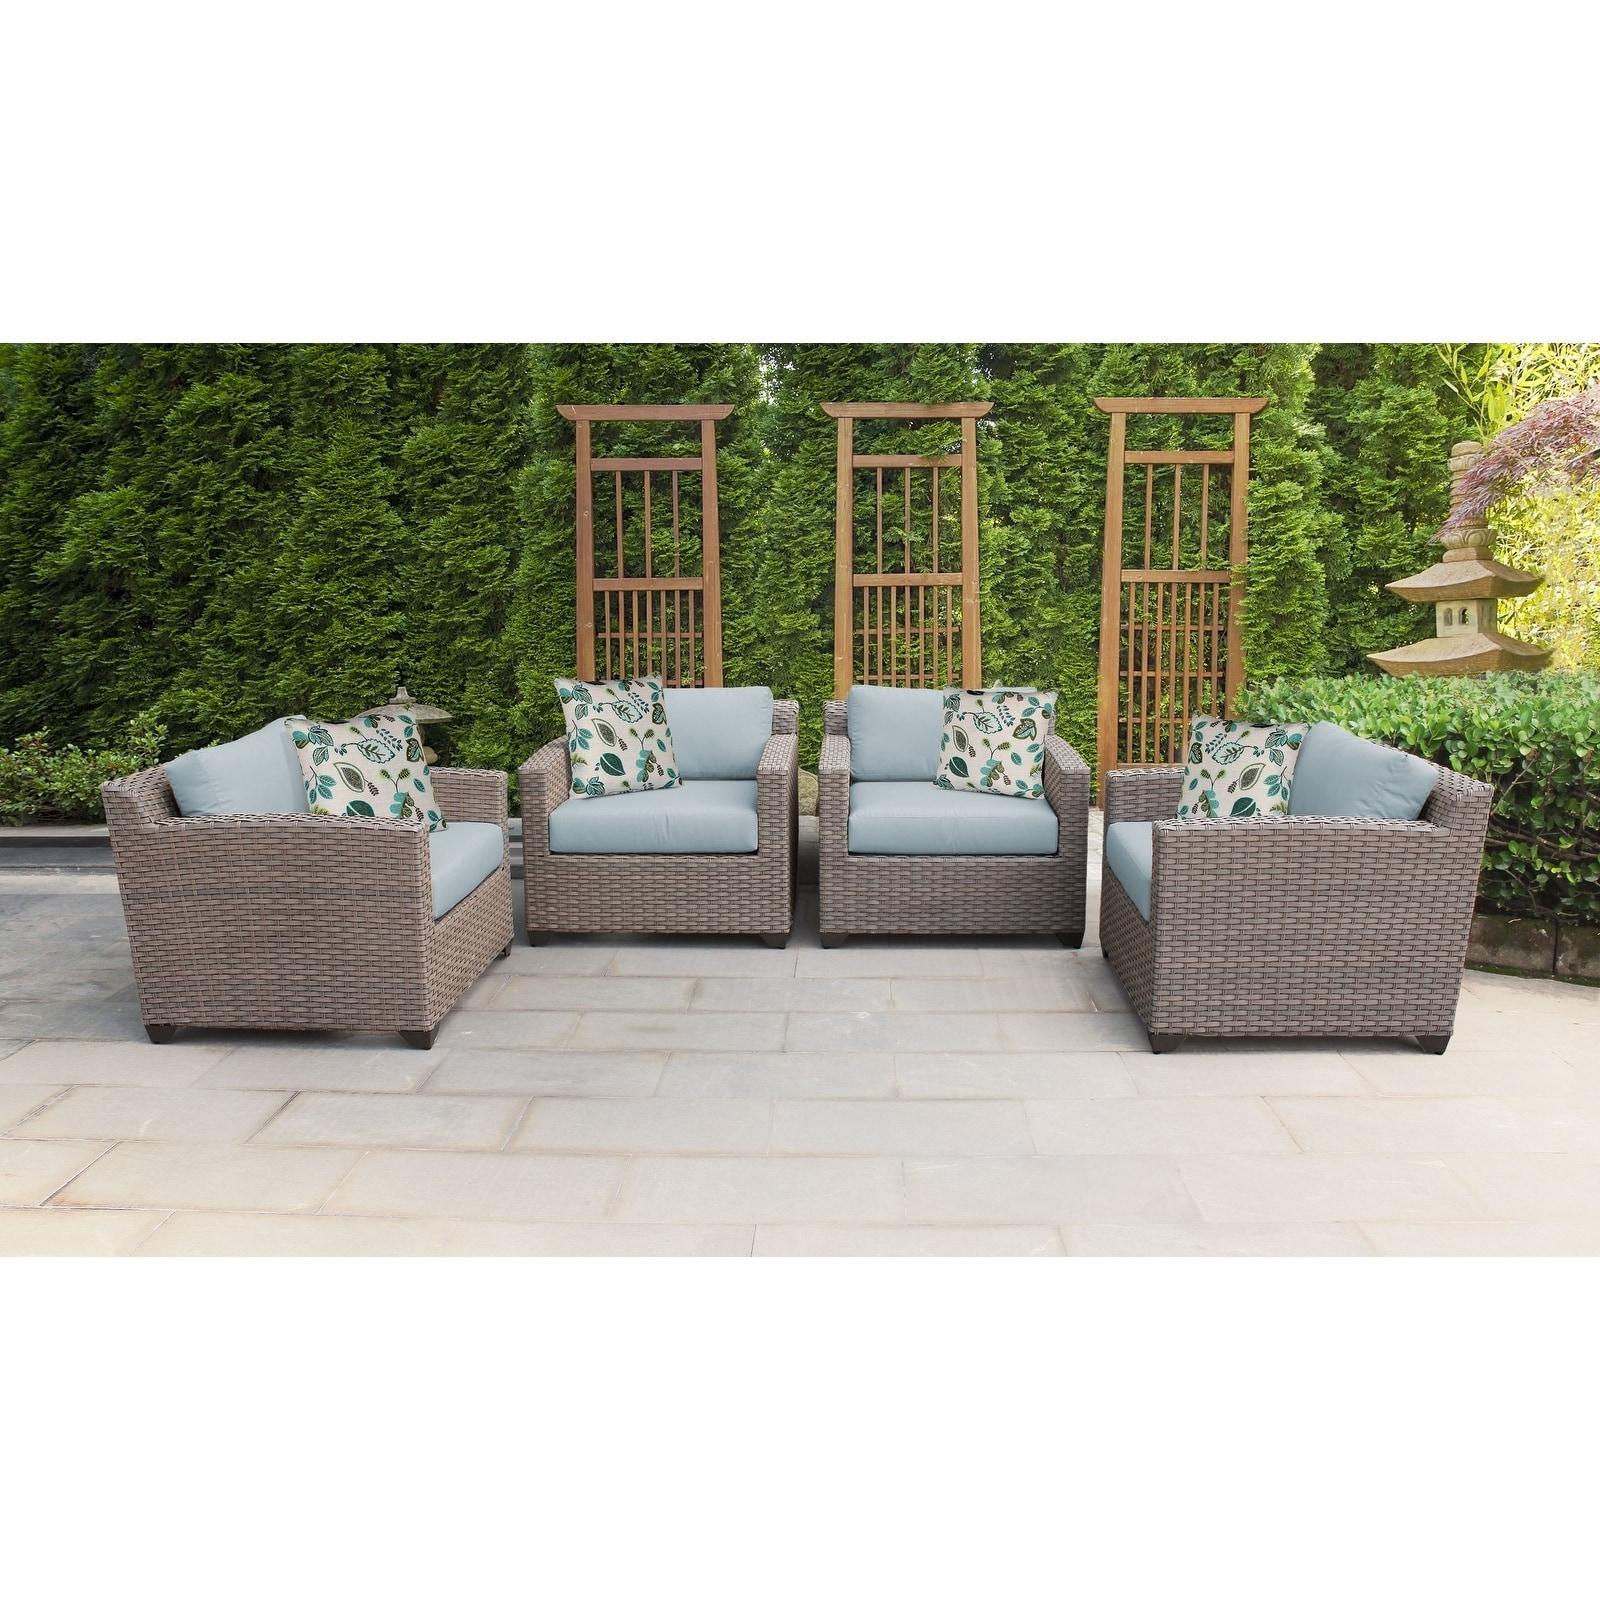 Outdoor Wicker Patio Furniture Set 04i